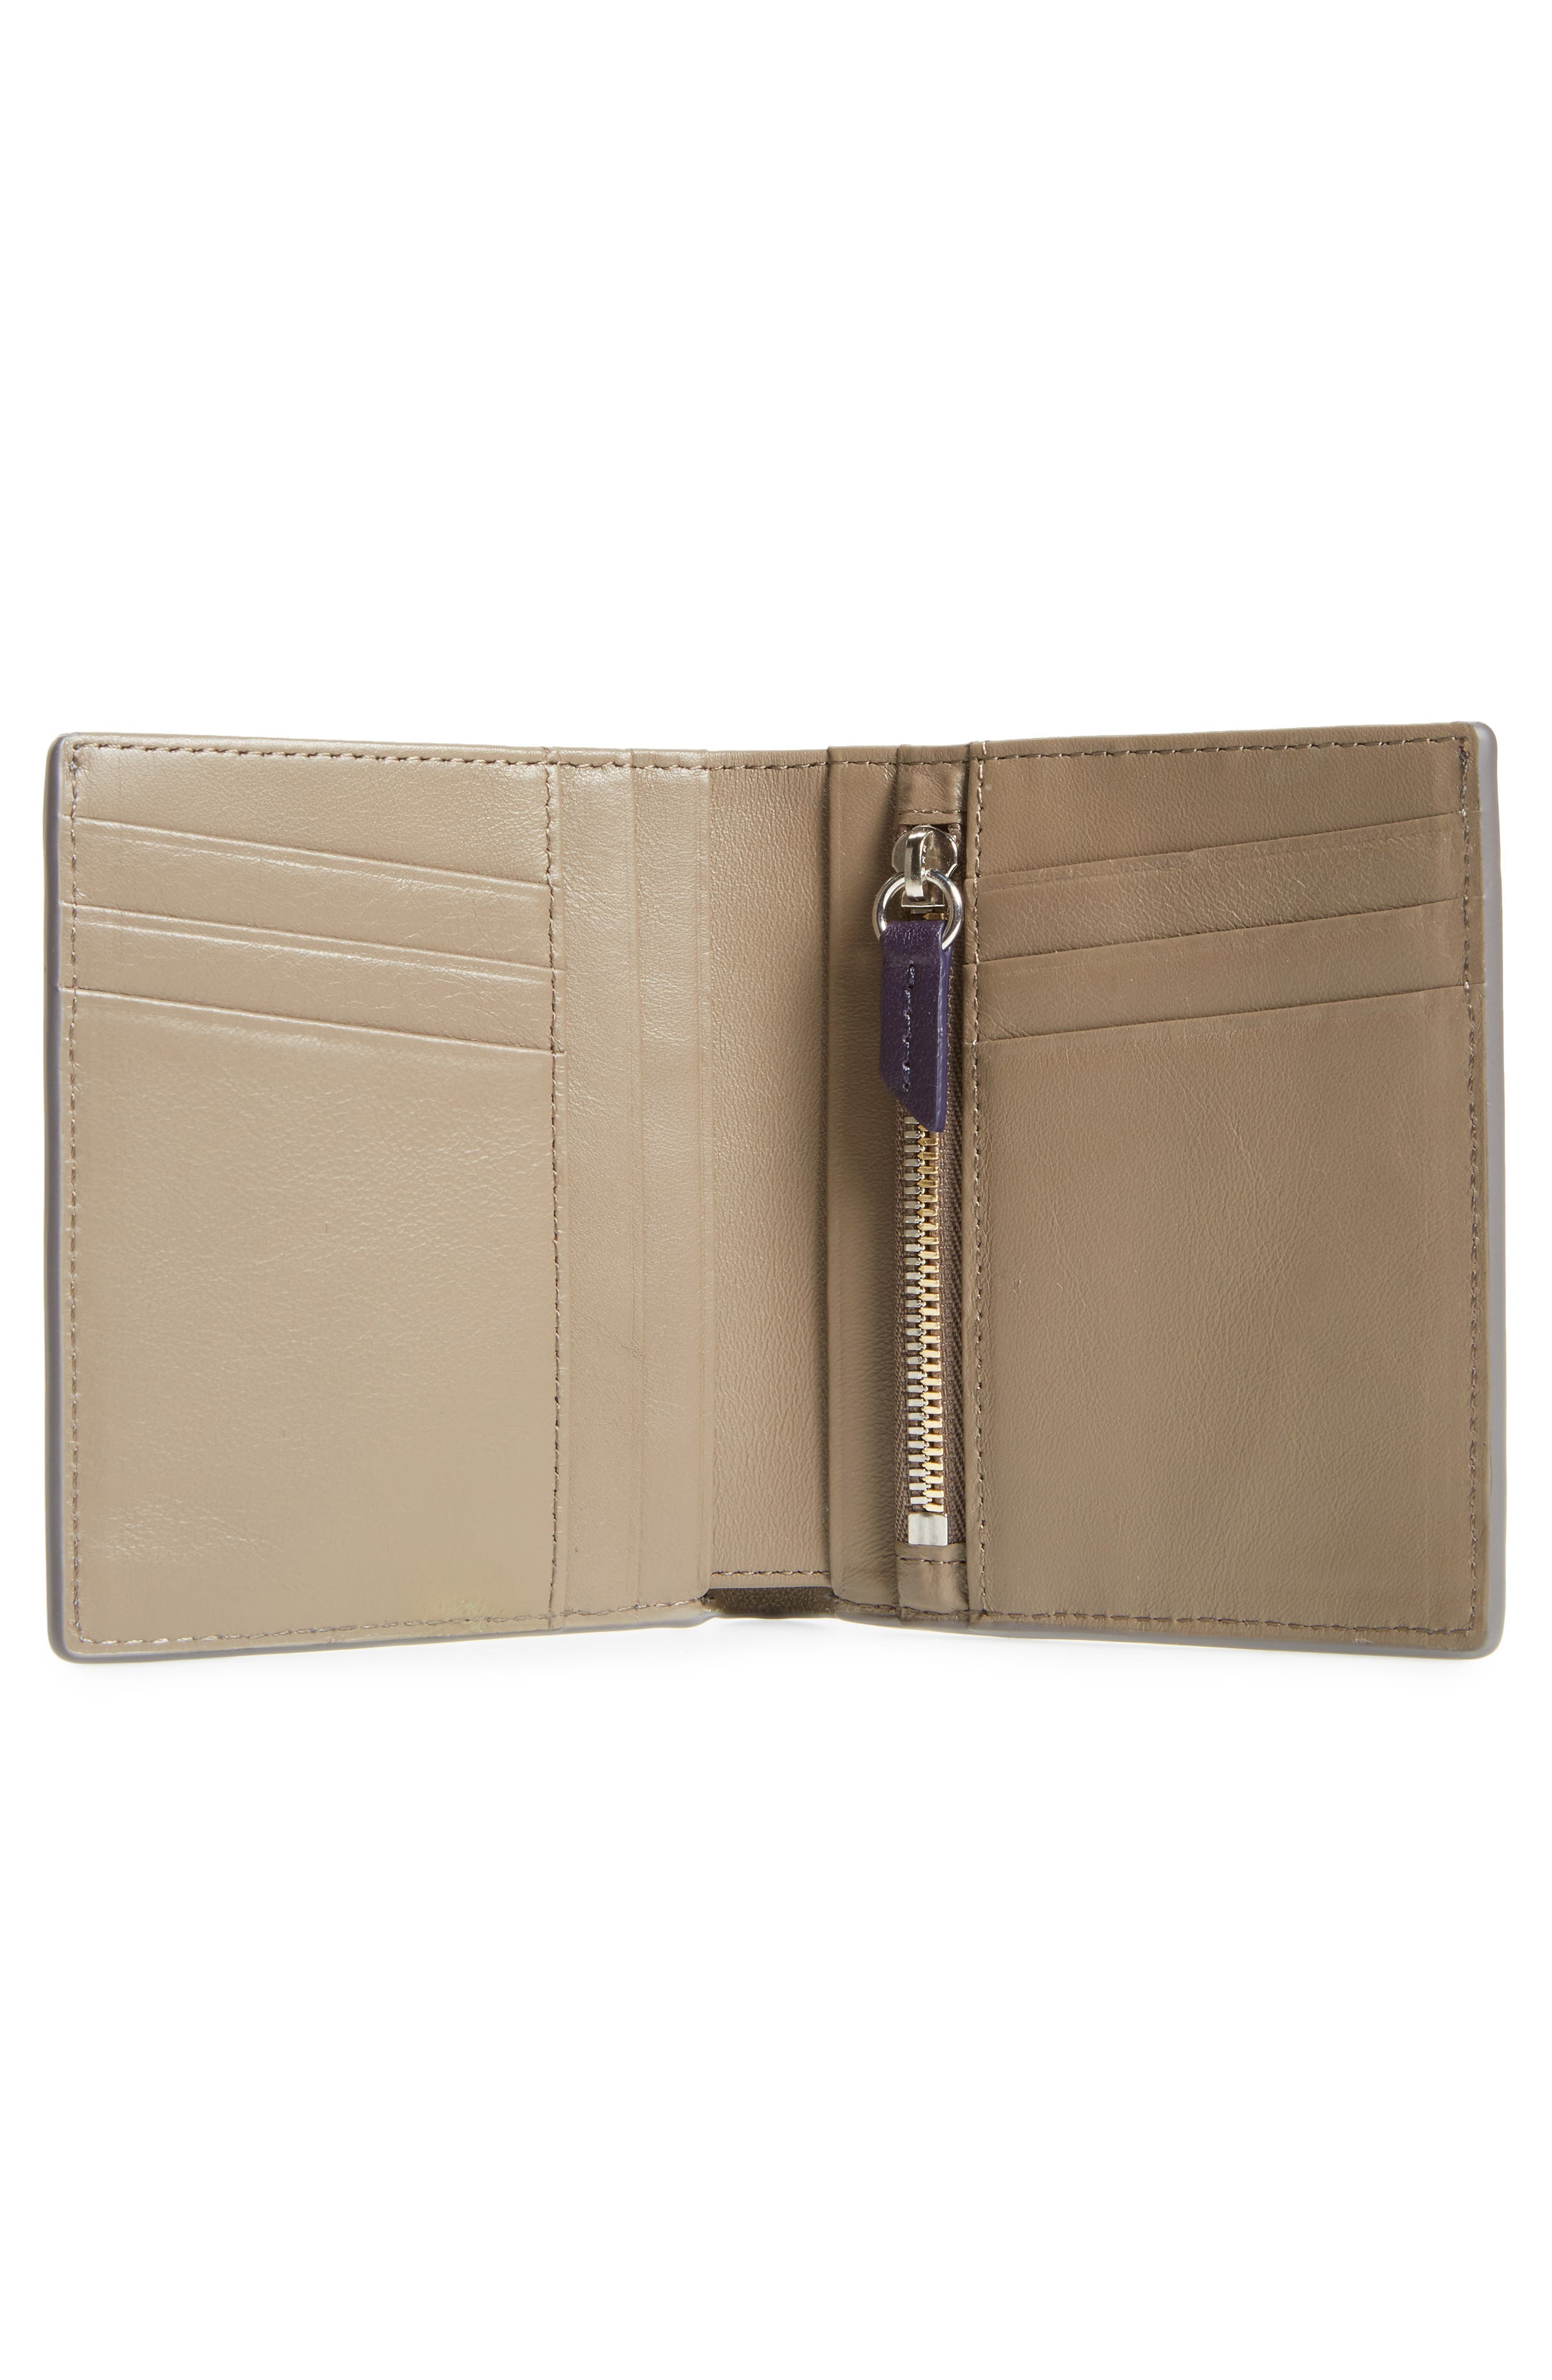 Bradley Bifold Leather Wallet,                             Alternate thumbnail 2, color,                             032